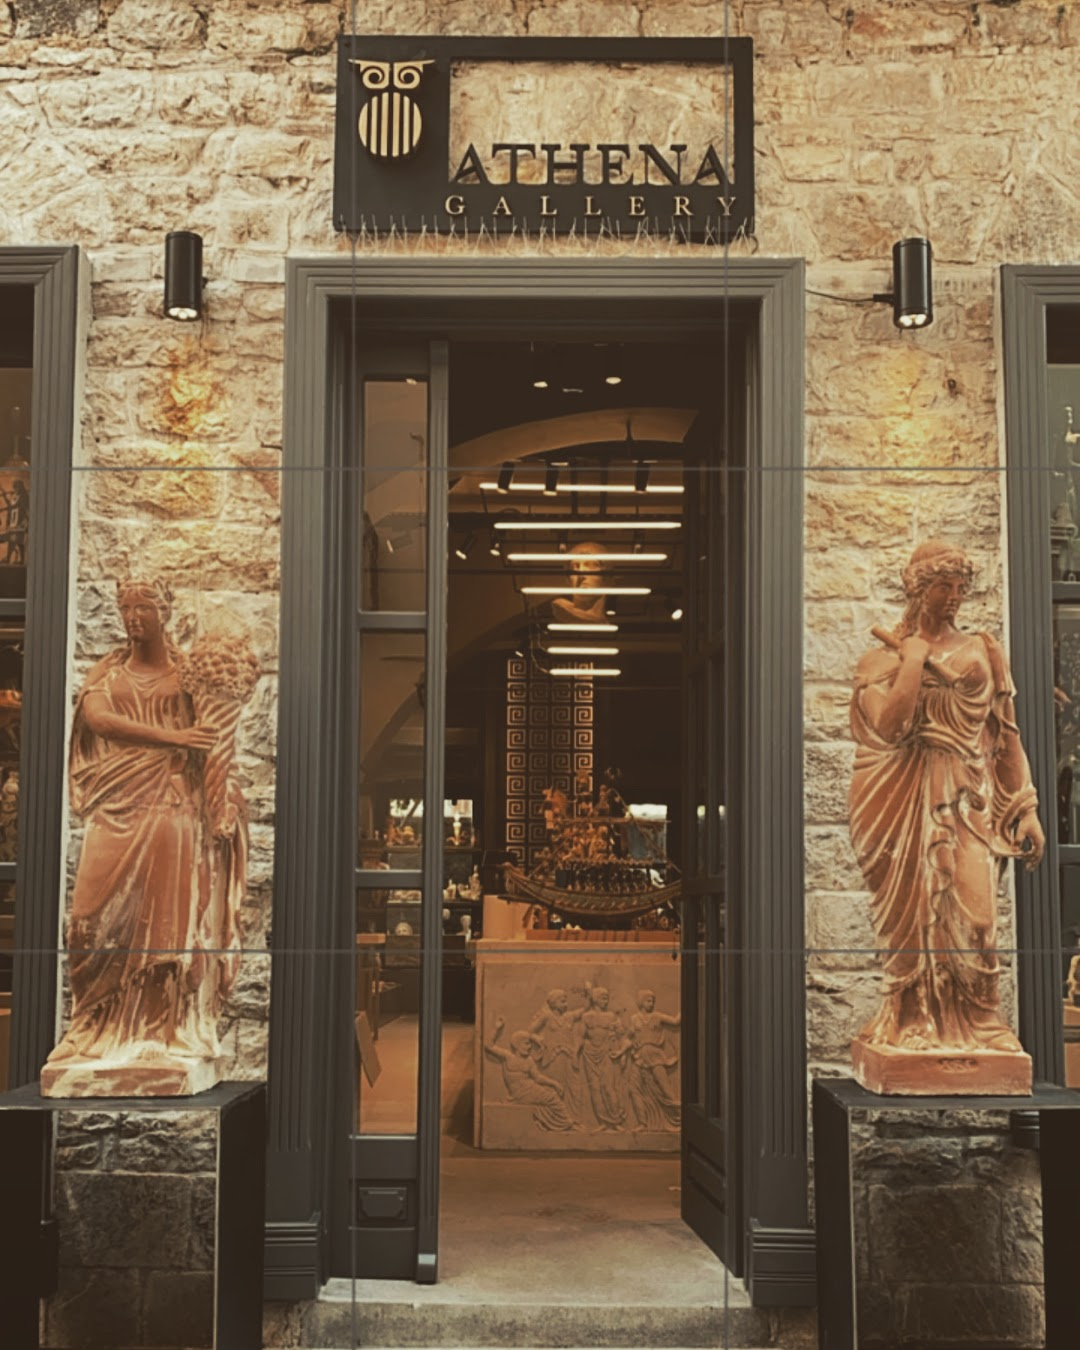 Athena Gallery